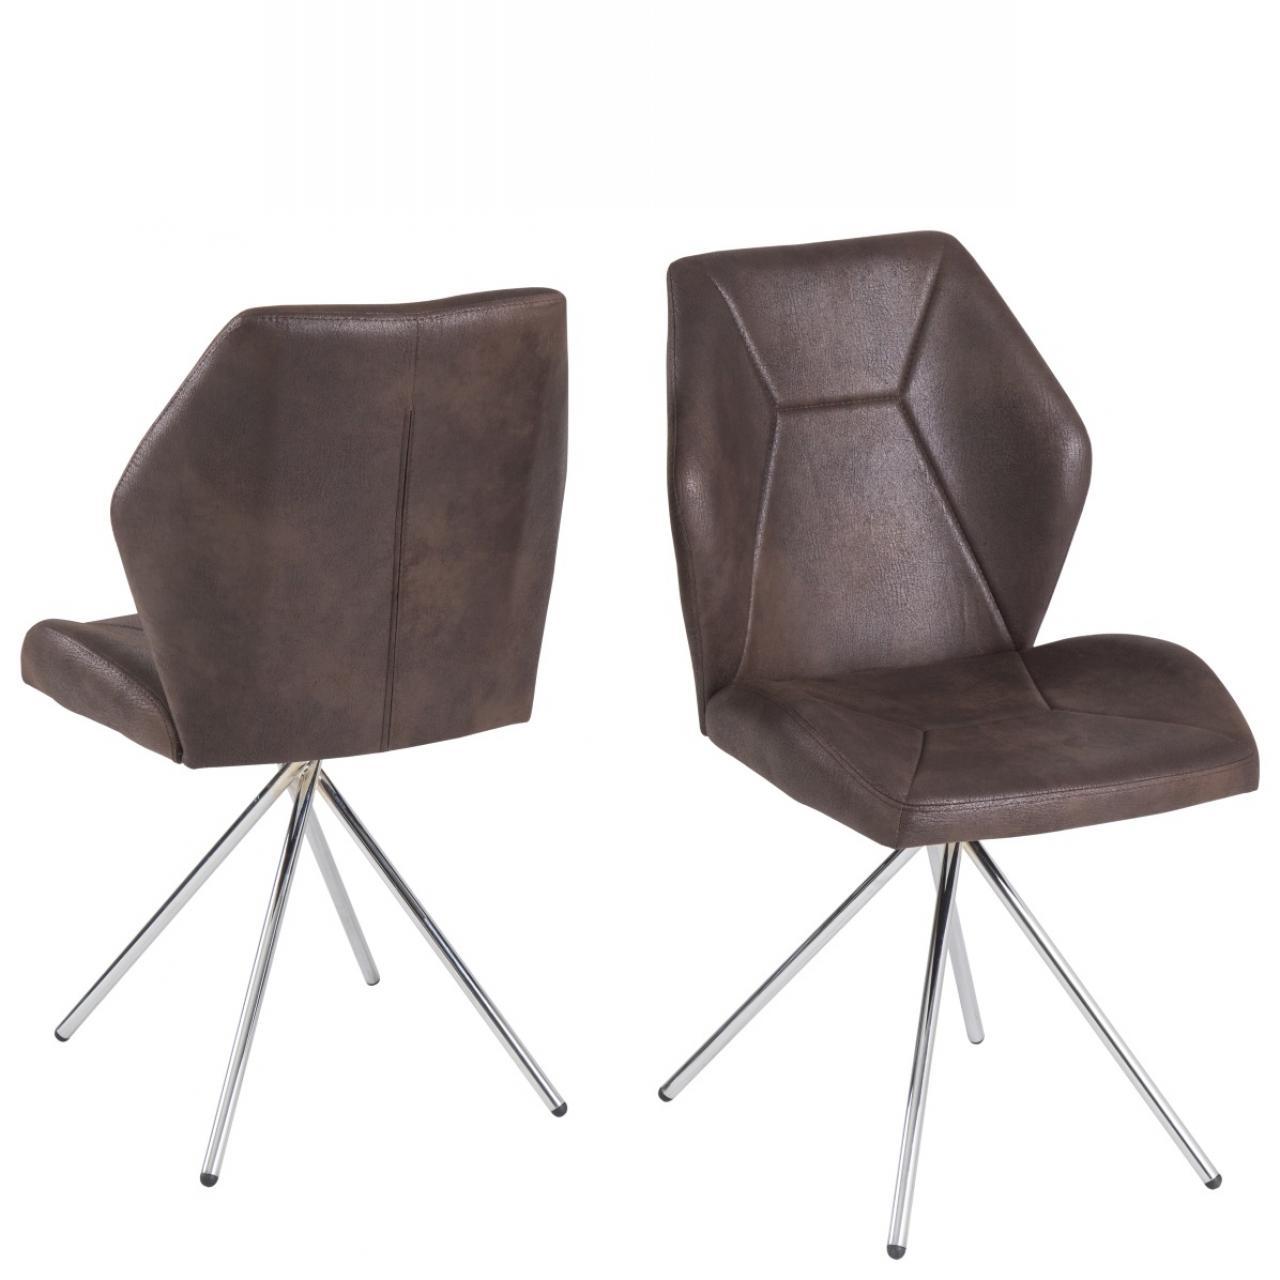 stuhl clarissa braun st hle hocker esszimmer. Black Bedroom Furniture Sets. Home Design Ideas